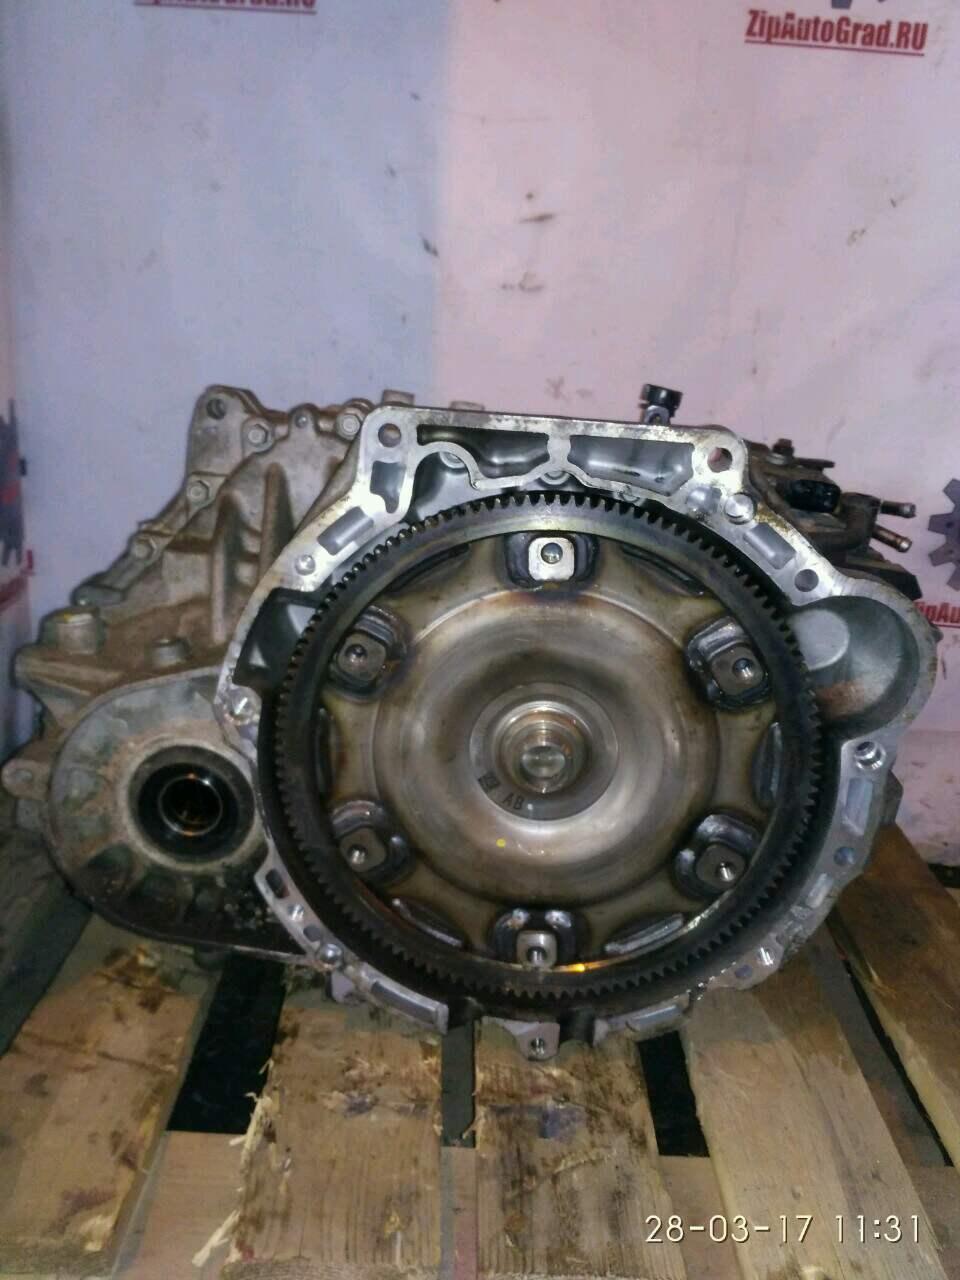 АКПП A6LF2 Kia Sportage. Кузов: 3. D4HA. , 2.0л., 136л.с.